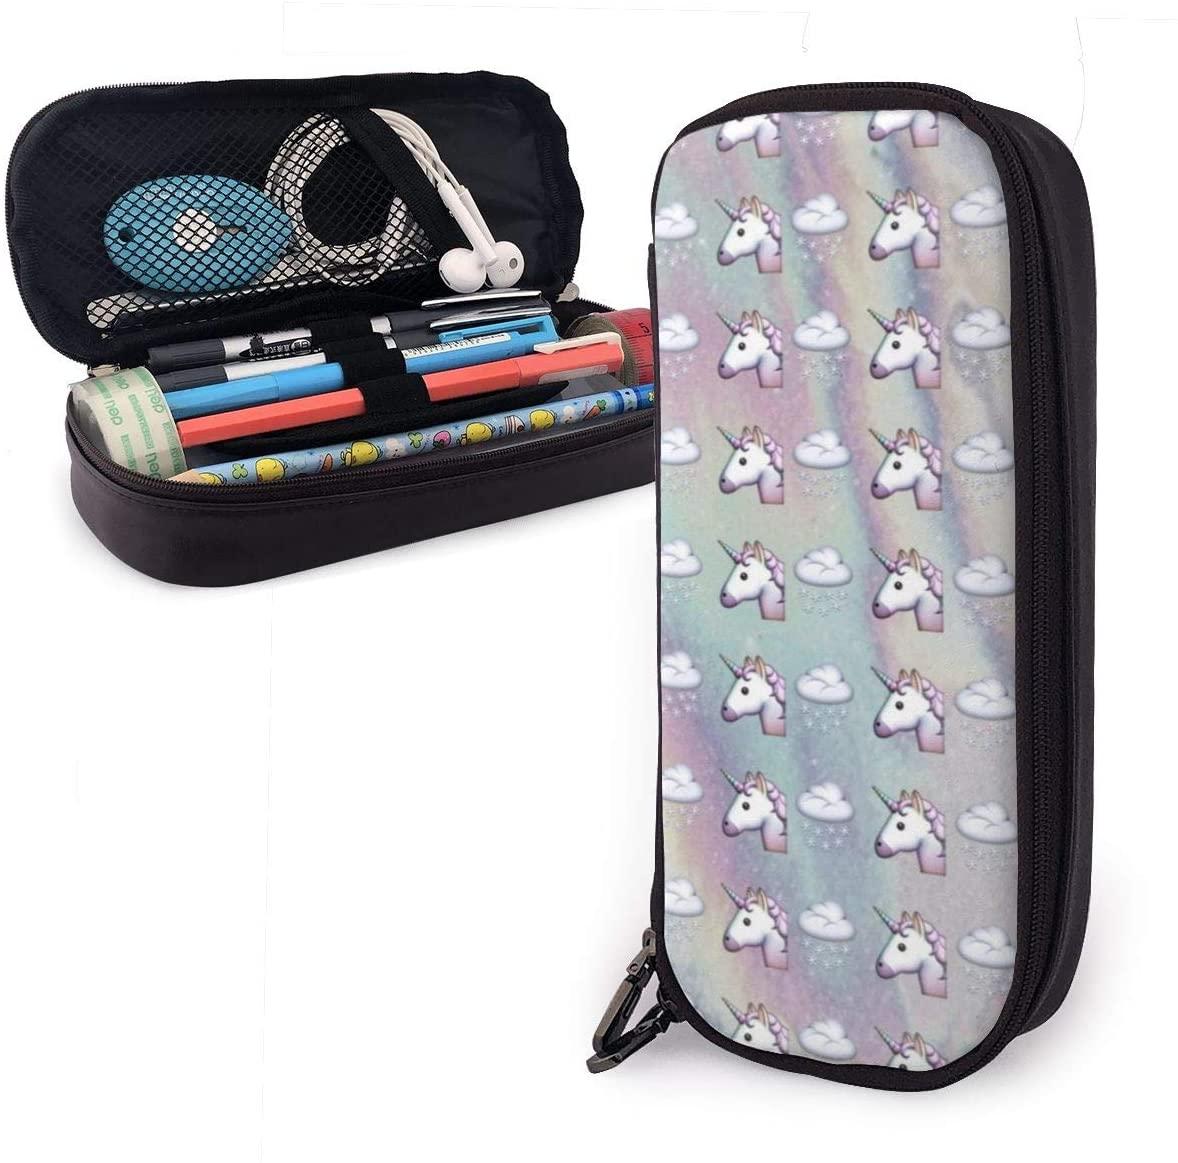 NiYoung Stylish Pen Bag Holder Rainbow Cute Unicorn Head Art Pen Case Box Zipper School Office Supplies Coin Organizer Cosmetic Bag - One Pocket Travel Accessories Back to School